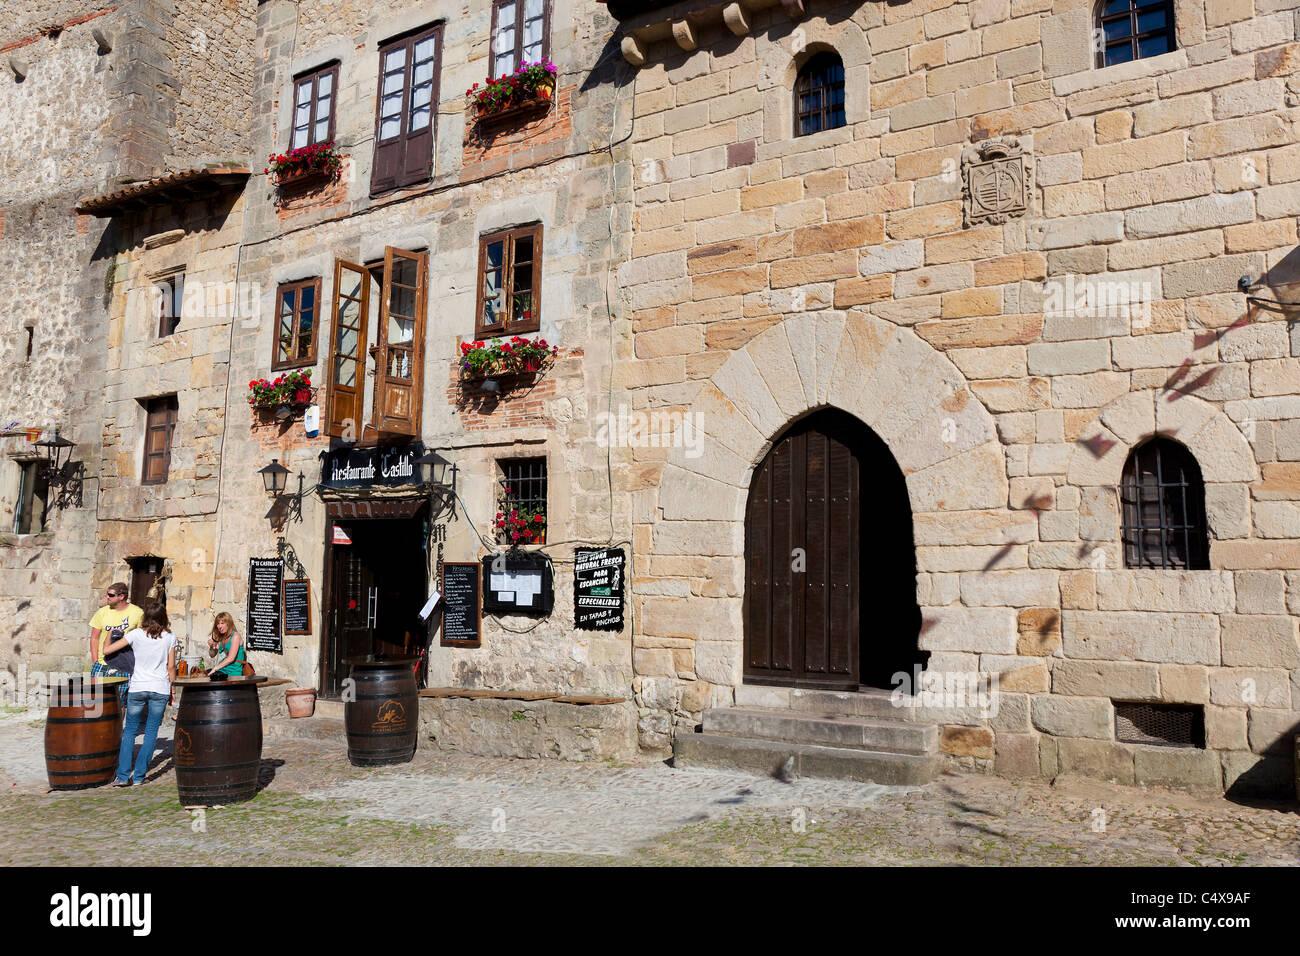 Square of Santillana del Mar, Cantabria, Spain - Stock Image